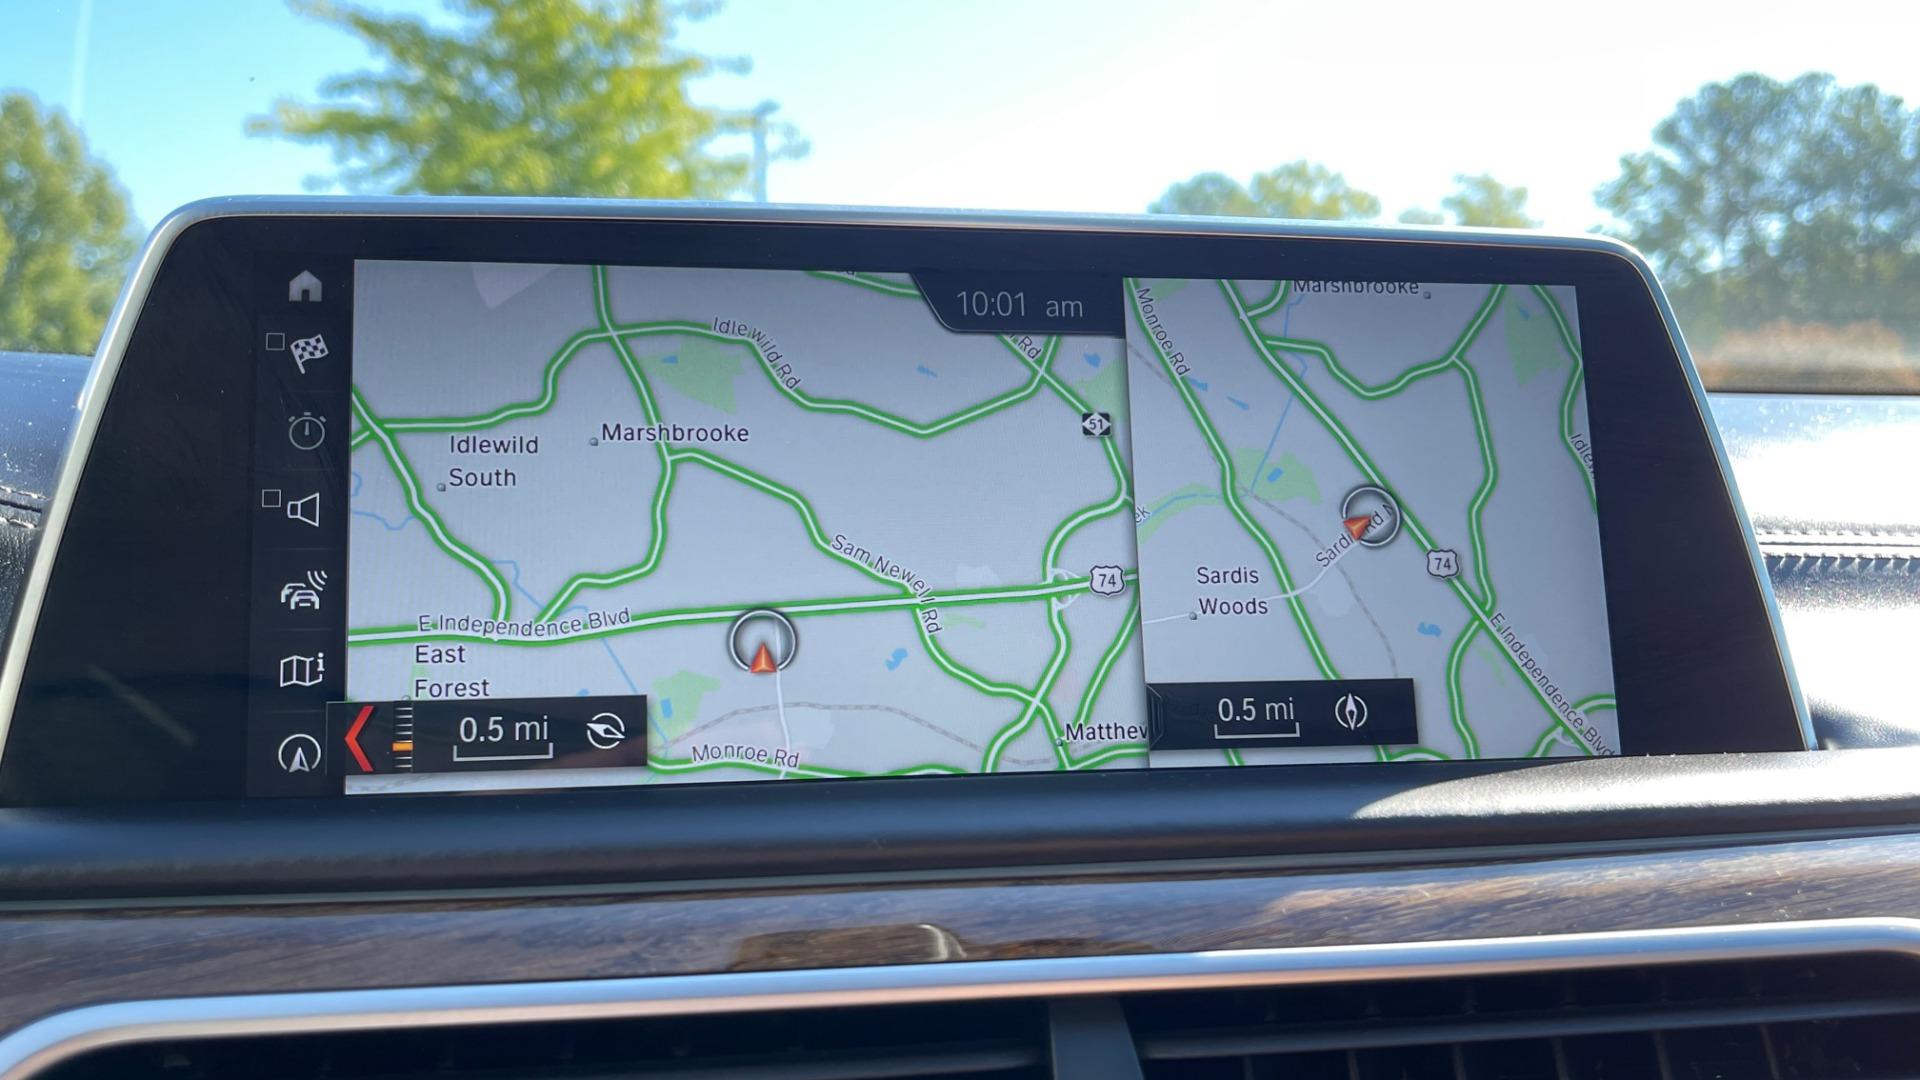 Used 2019 BMW 7 SERIES 750I XDRIVE M-SPORT / EXEC PKG / DRVR ASST PLUS / CLD WTHR / PAR for sale $60,995 at Formula Imports in Charlotte NC 28227 35